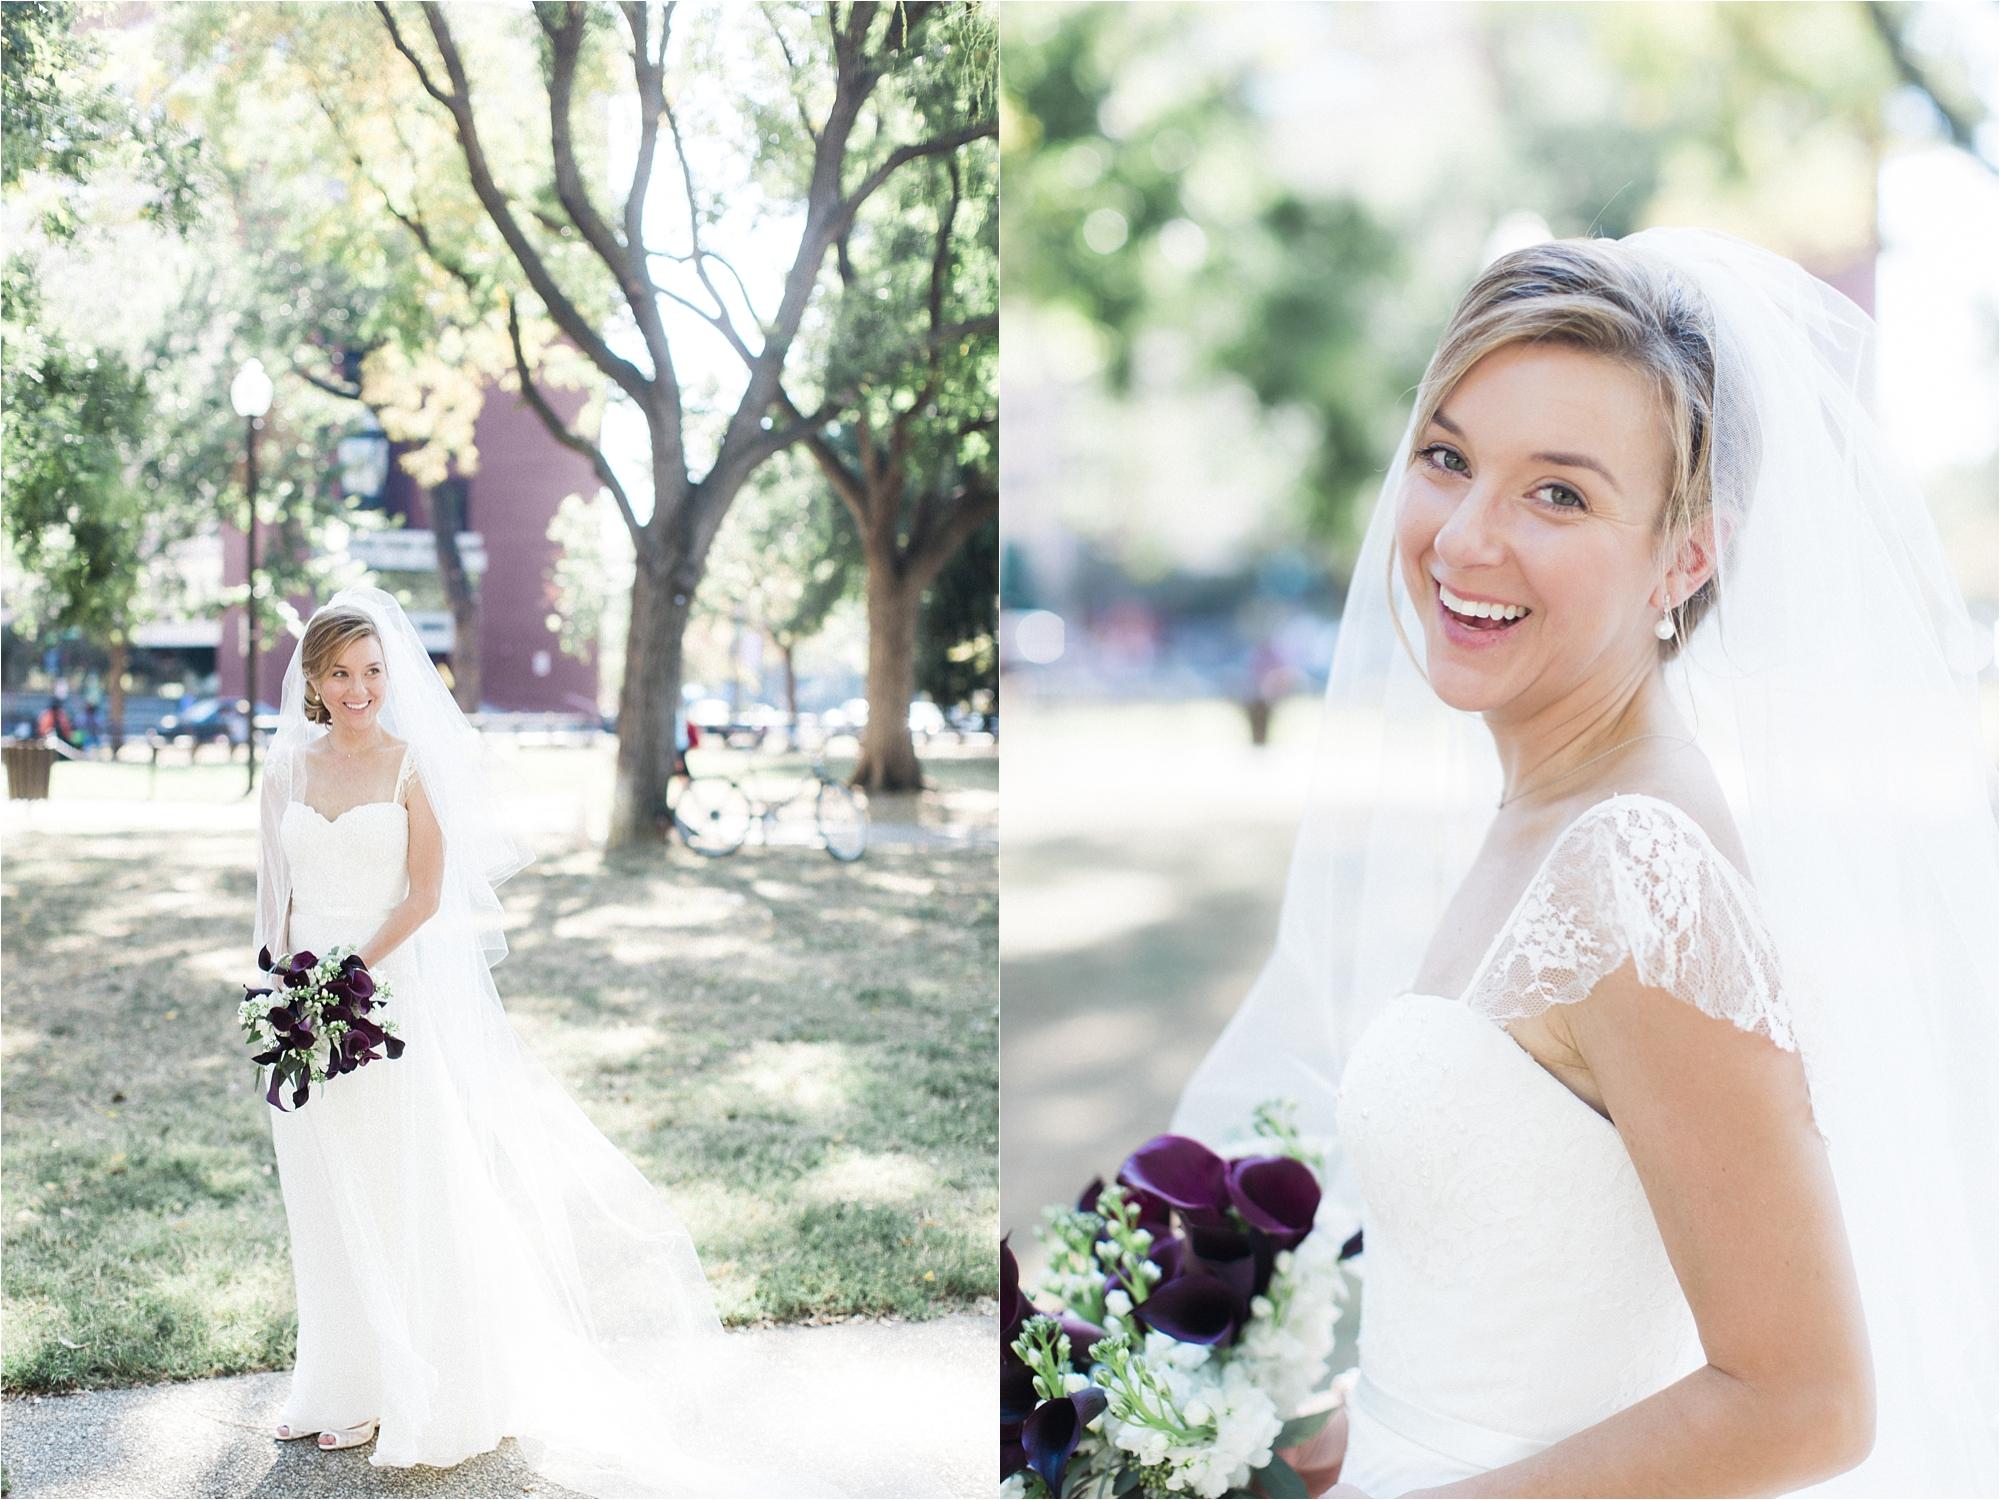 stephanie-yonce-photography-elegant-private-club-washington-dc-wedding-photos_0023.jpg